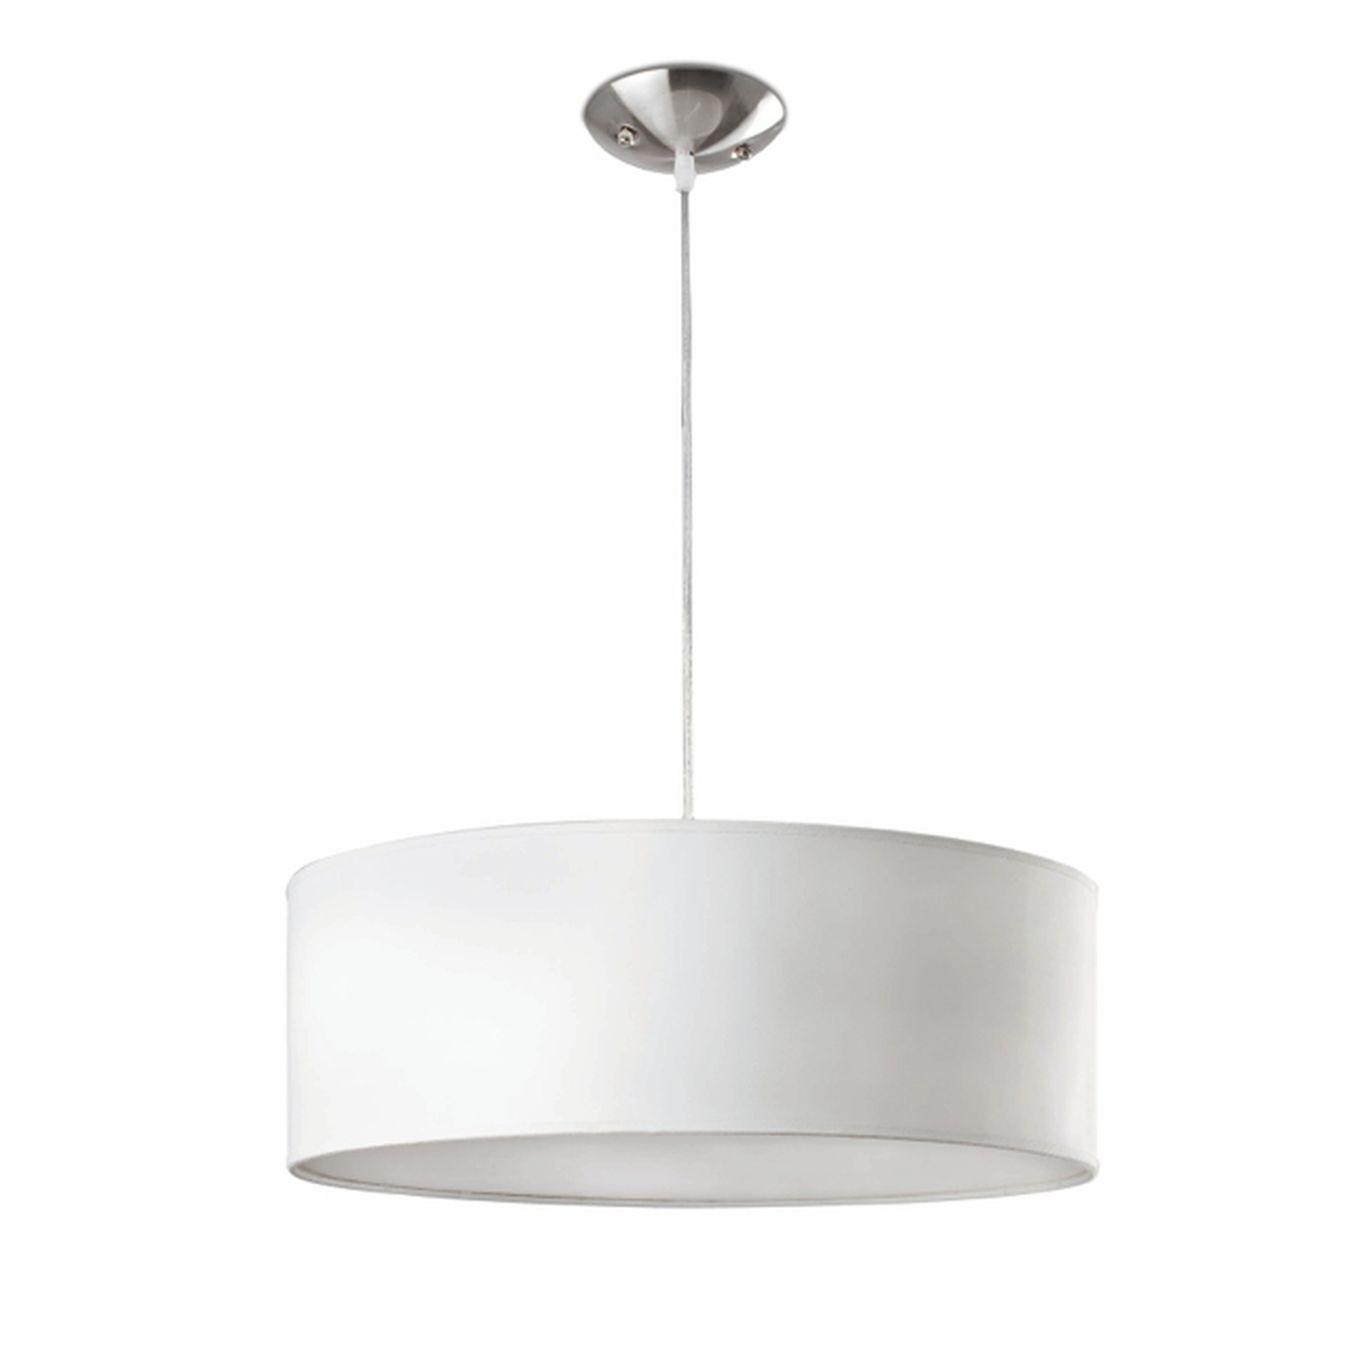 Comprar l mpara colgante blanca cl sica cil ndrica for Lamparas de interior modernas